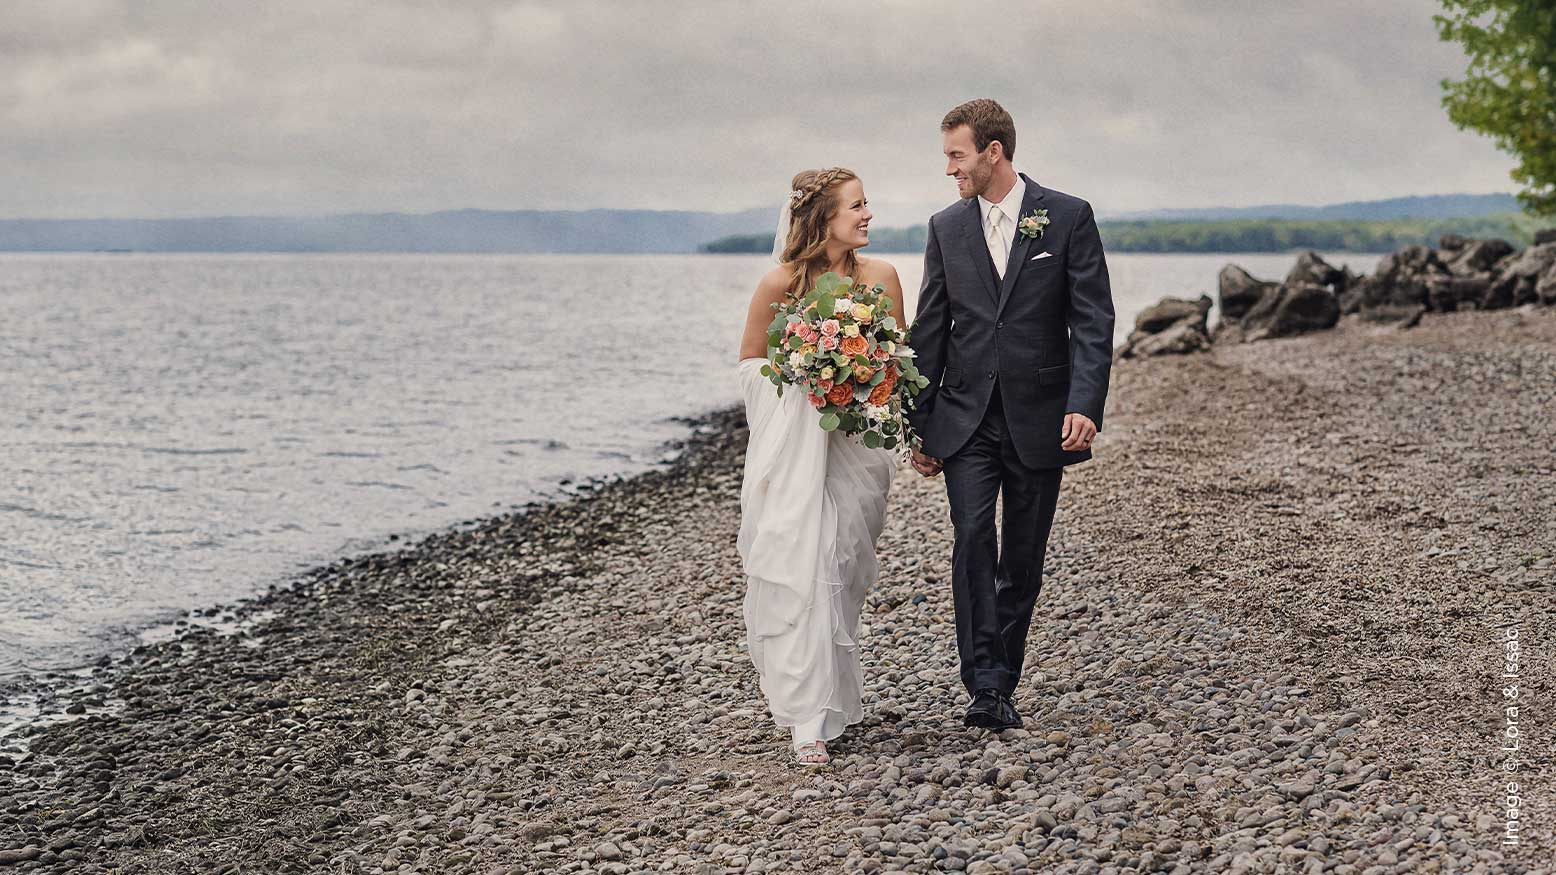 Pandemic Profitability: The New World For Wedding Photographers